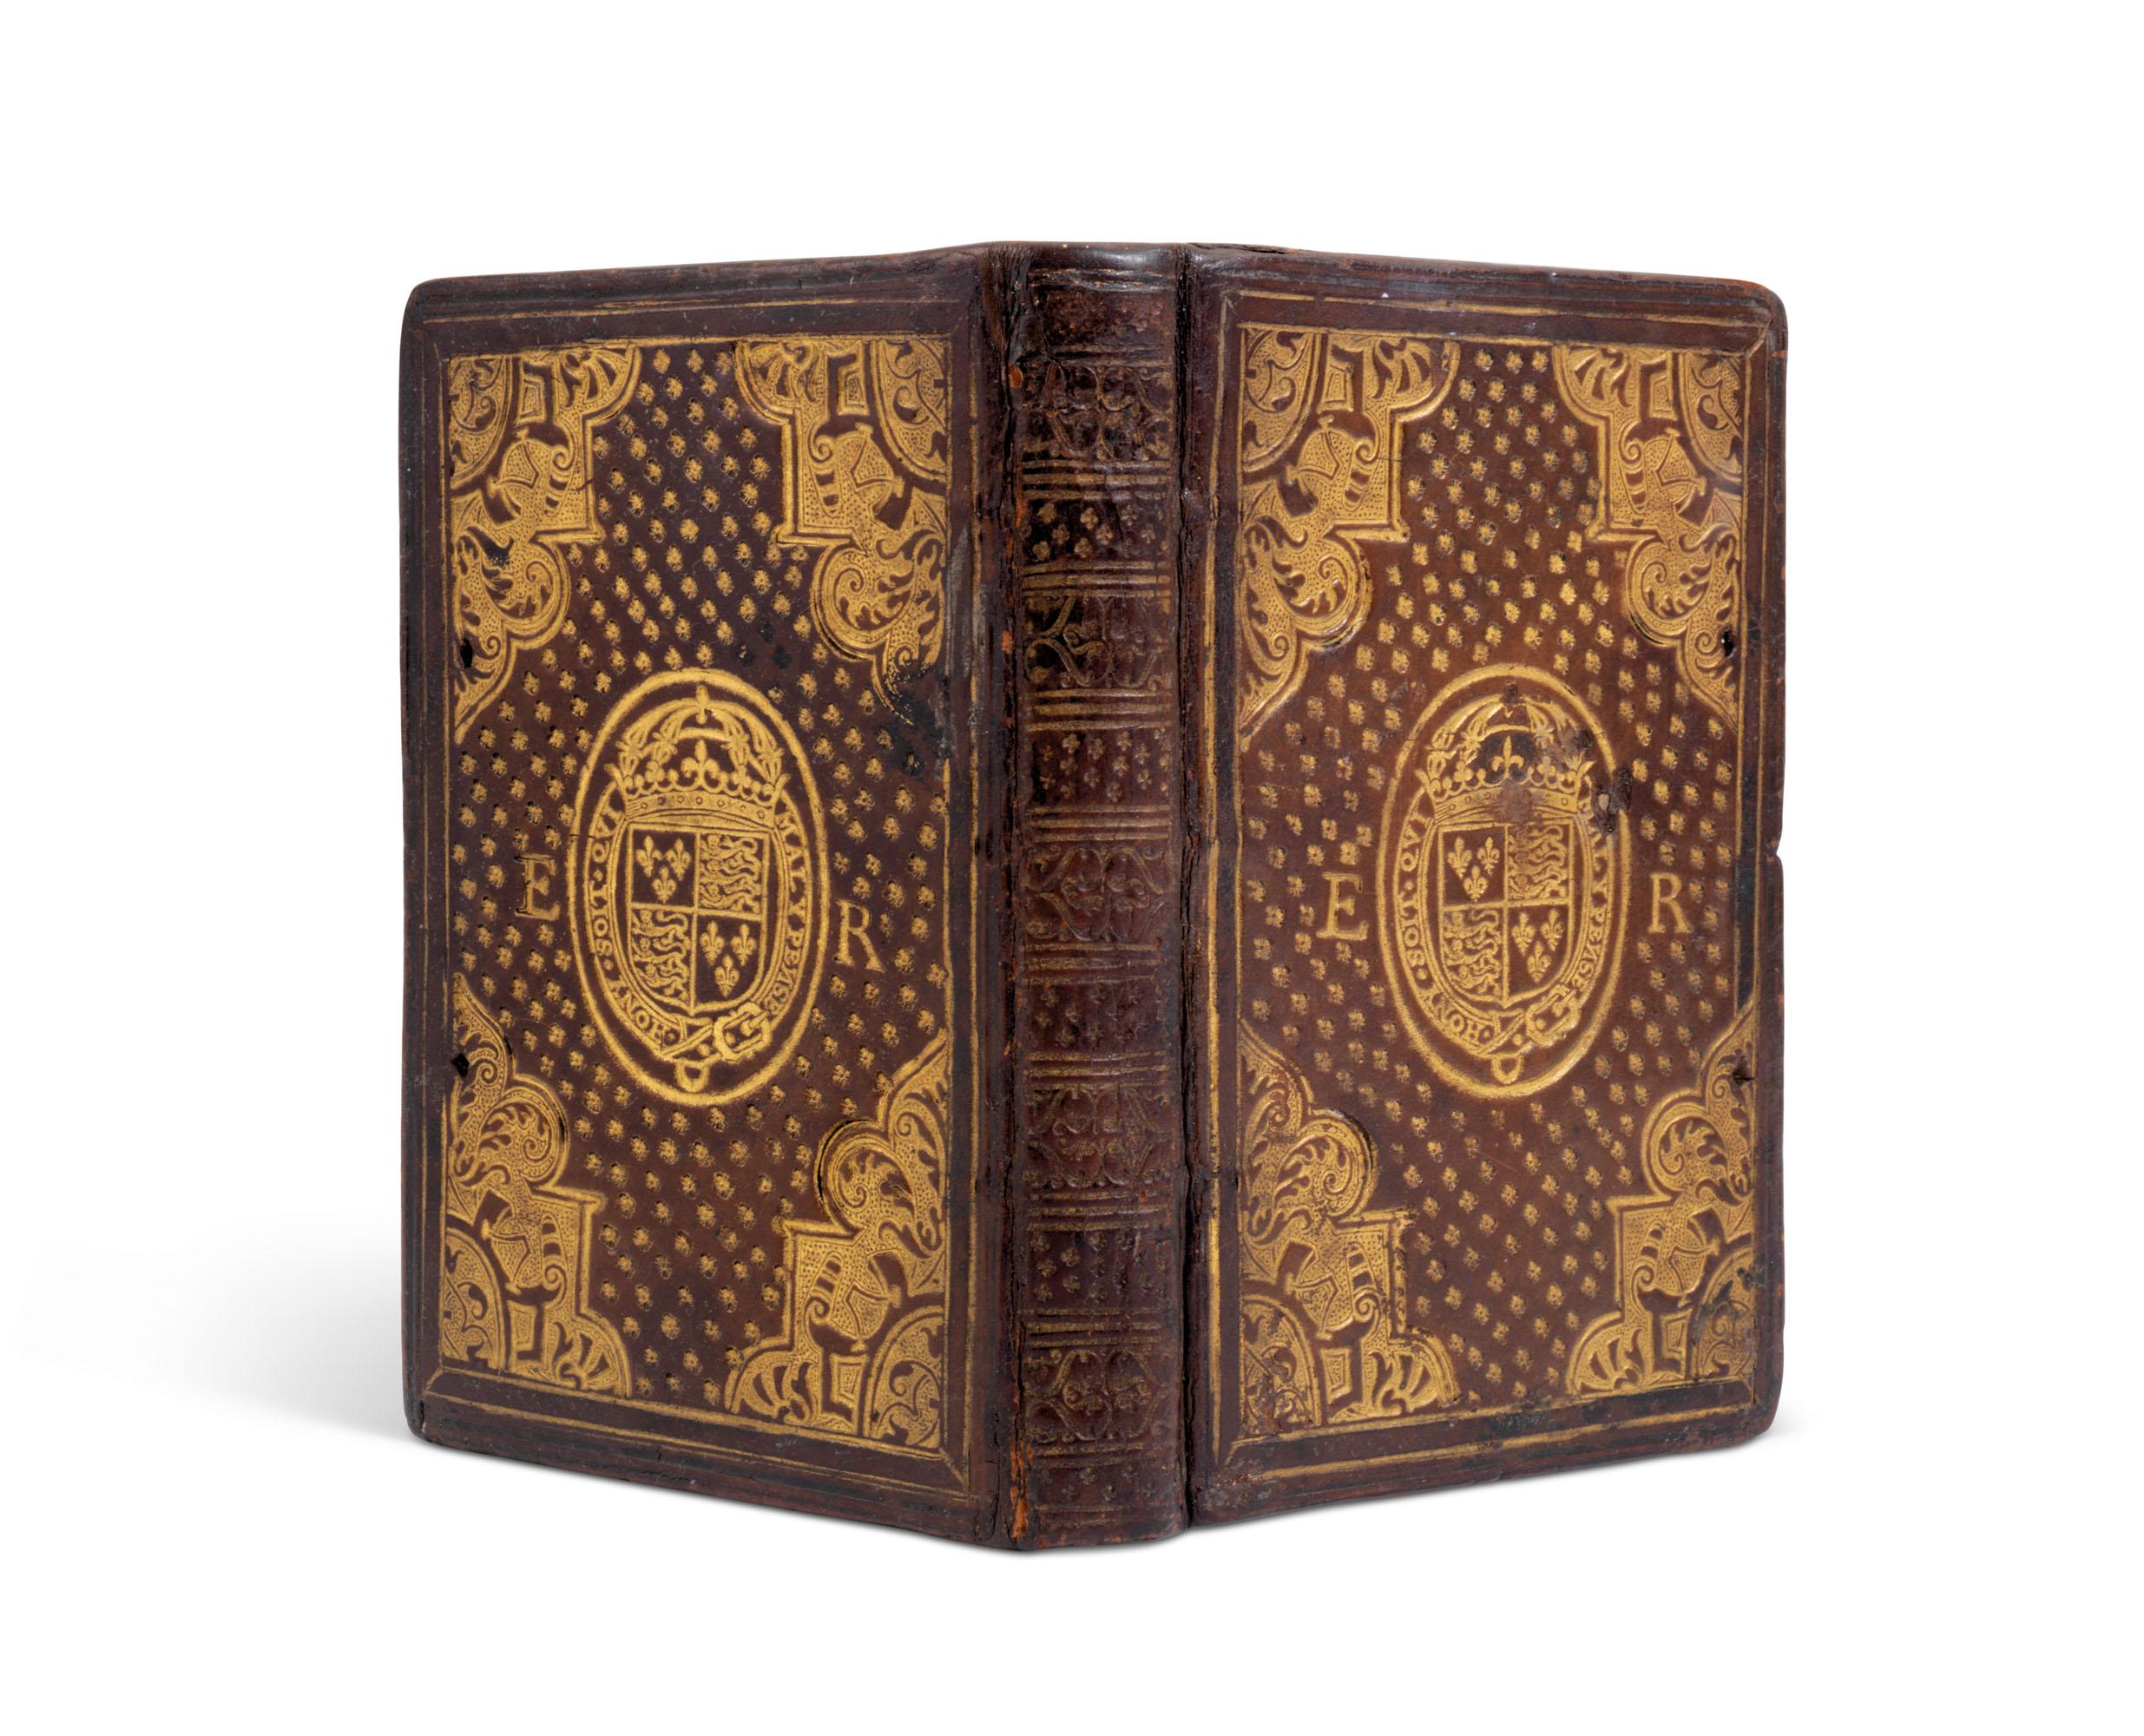 Elizabeth I bookbinding